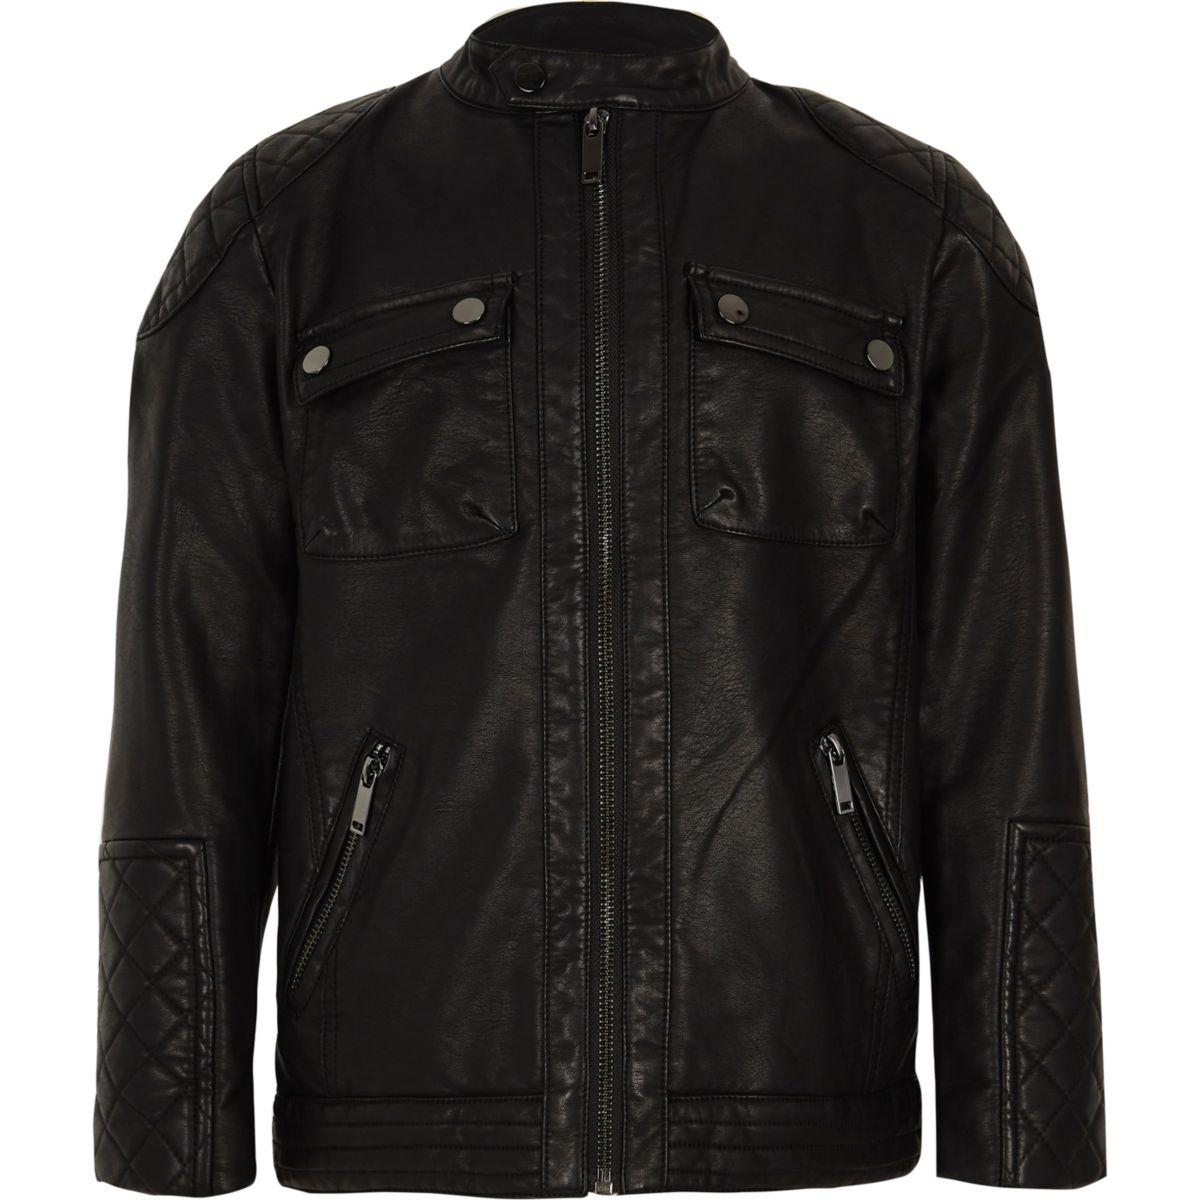 Boys black faux leather racer jacket